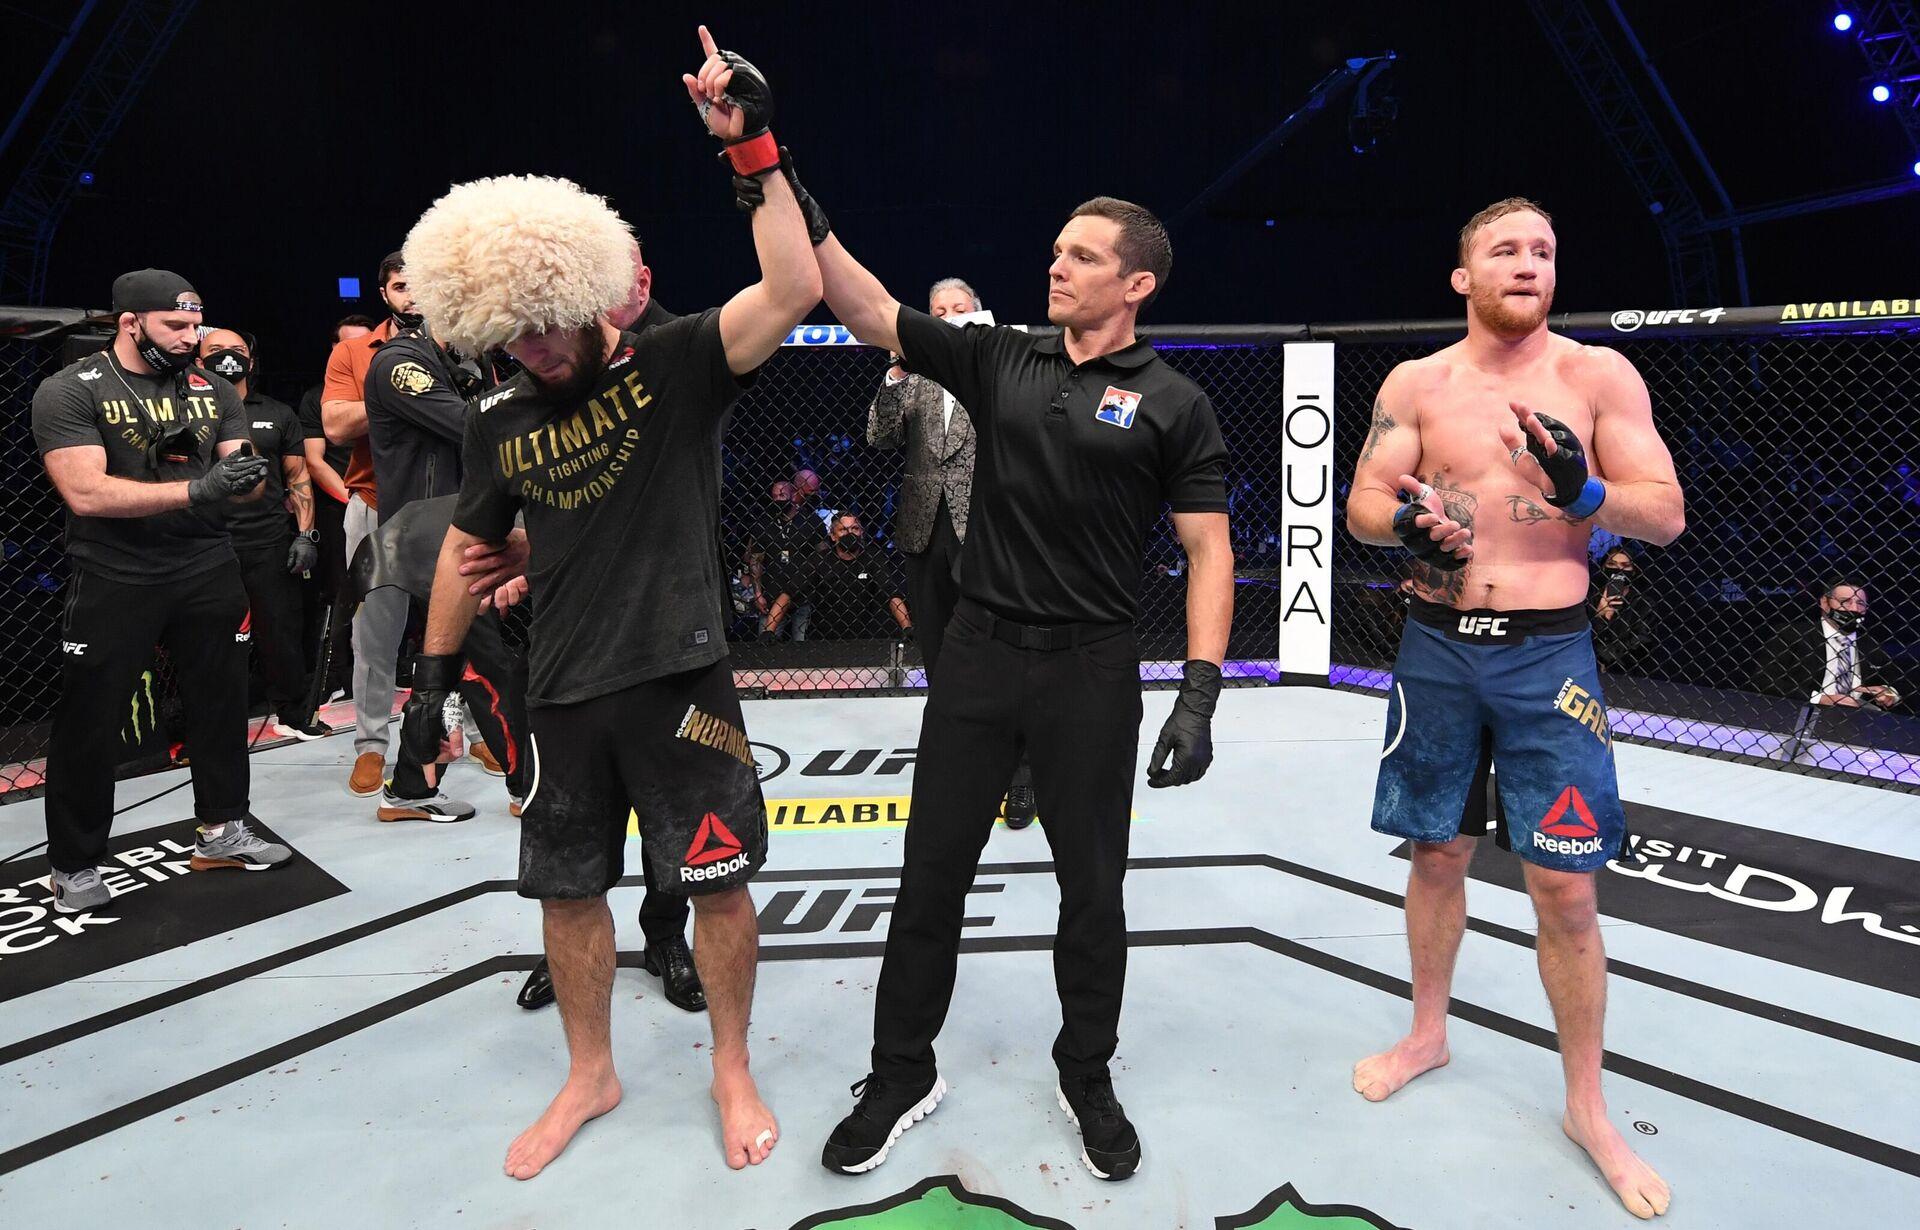 Хабиб Нурмагомедов защитил титул чемпиона UFC в легком весе - РИА Новости, 1920, 17.11.2020